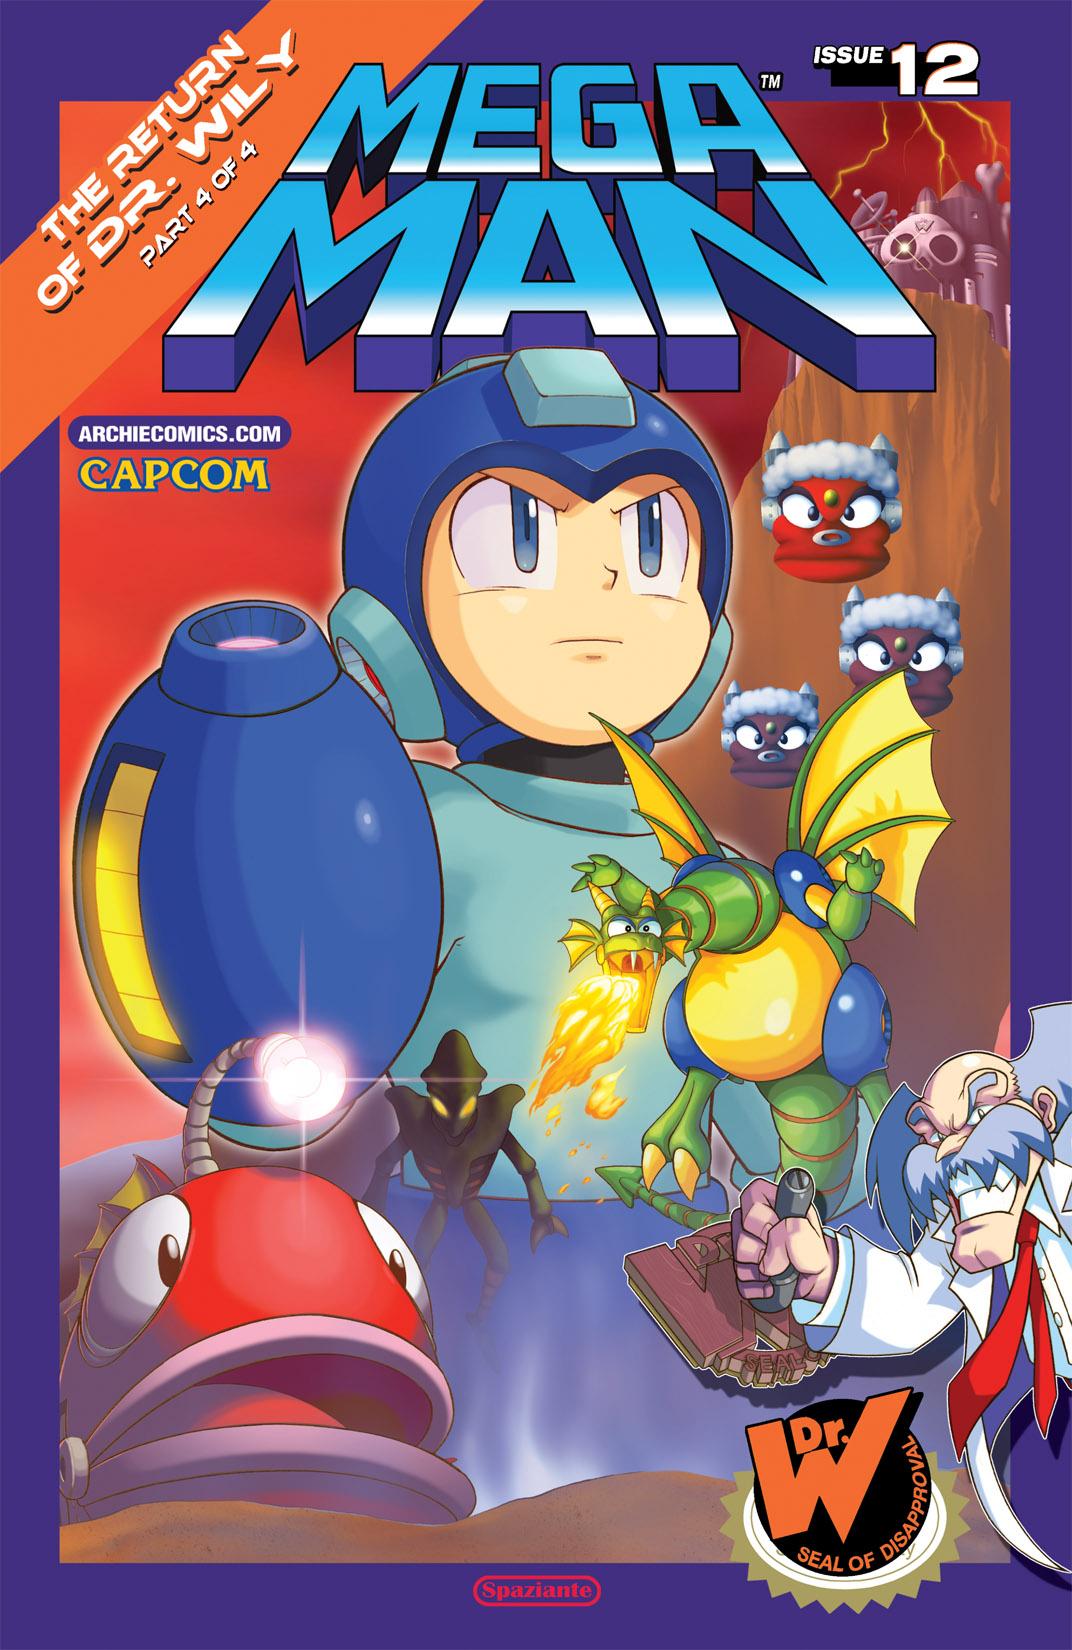 mega man issue 12 archie comics mmkb fandom powered